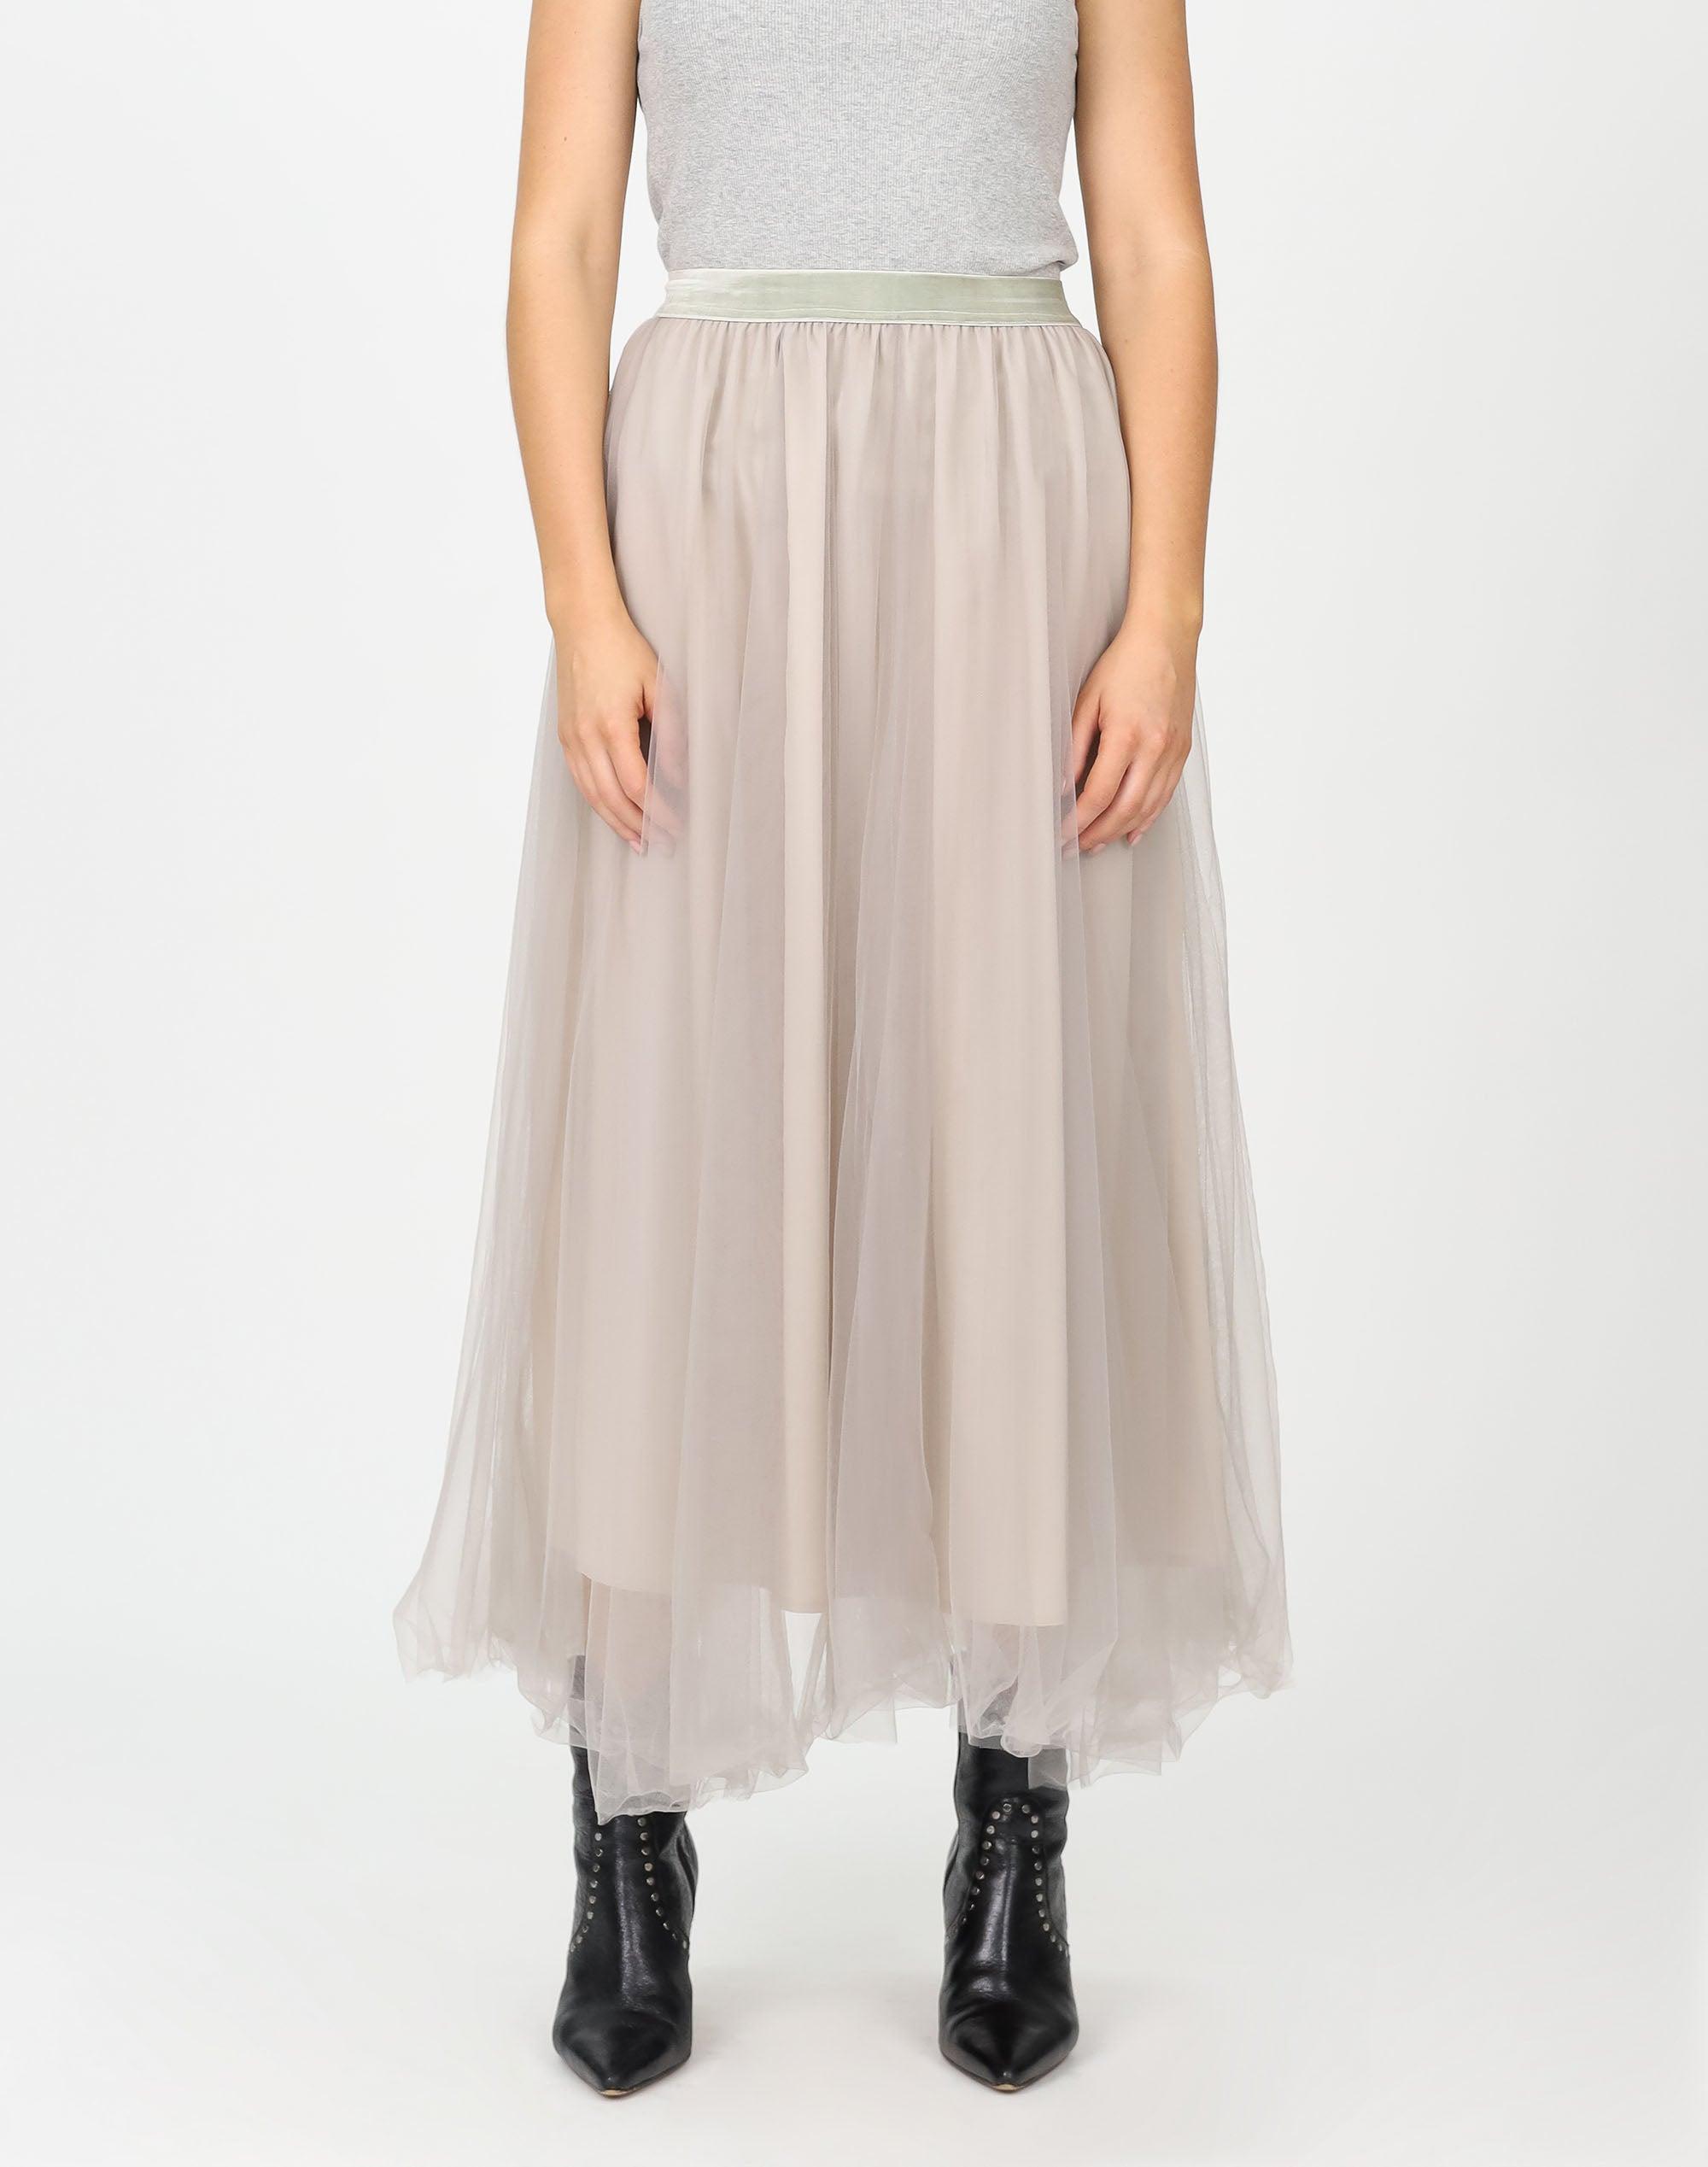 Venus Mesh Skirt